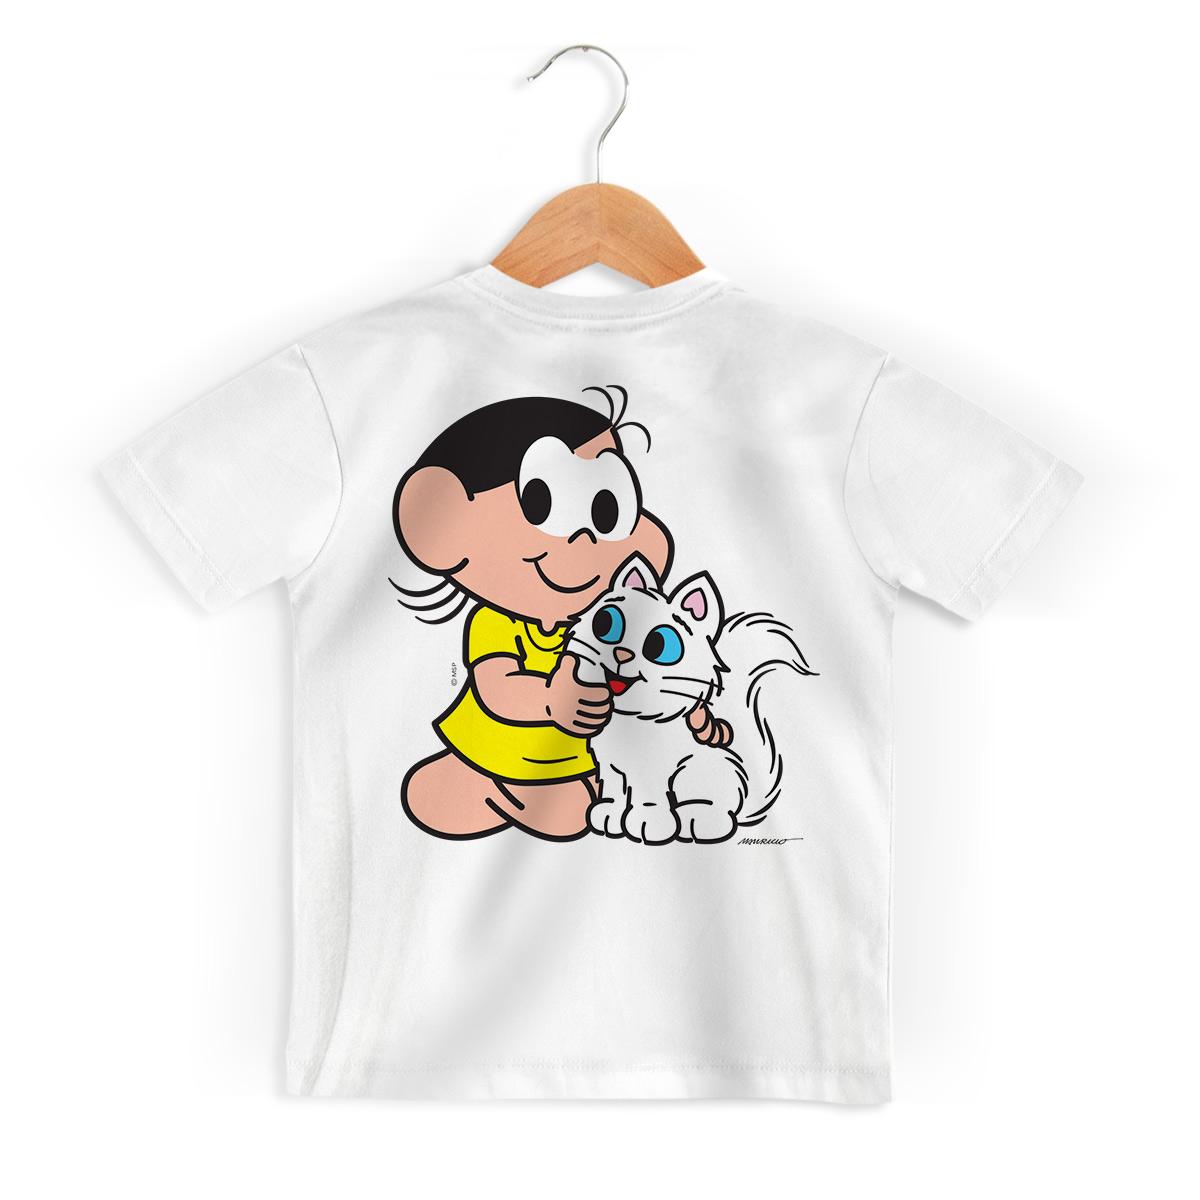 Camiseta Infantil Turma da M�nica Kids Olh�es Mingau